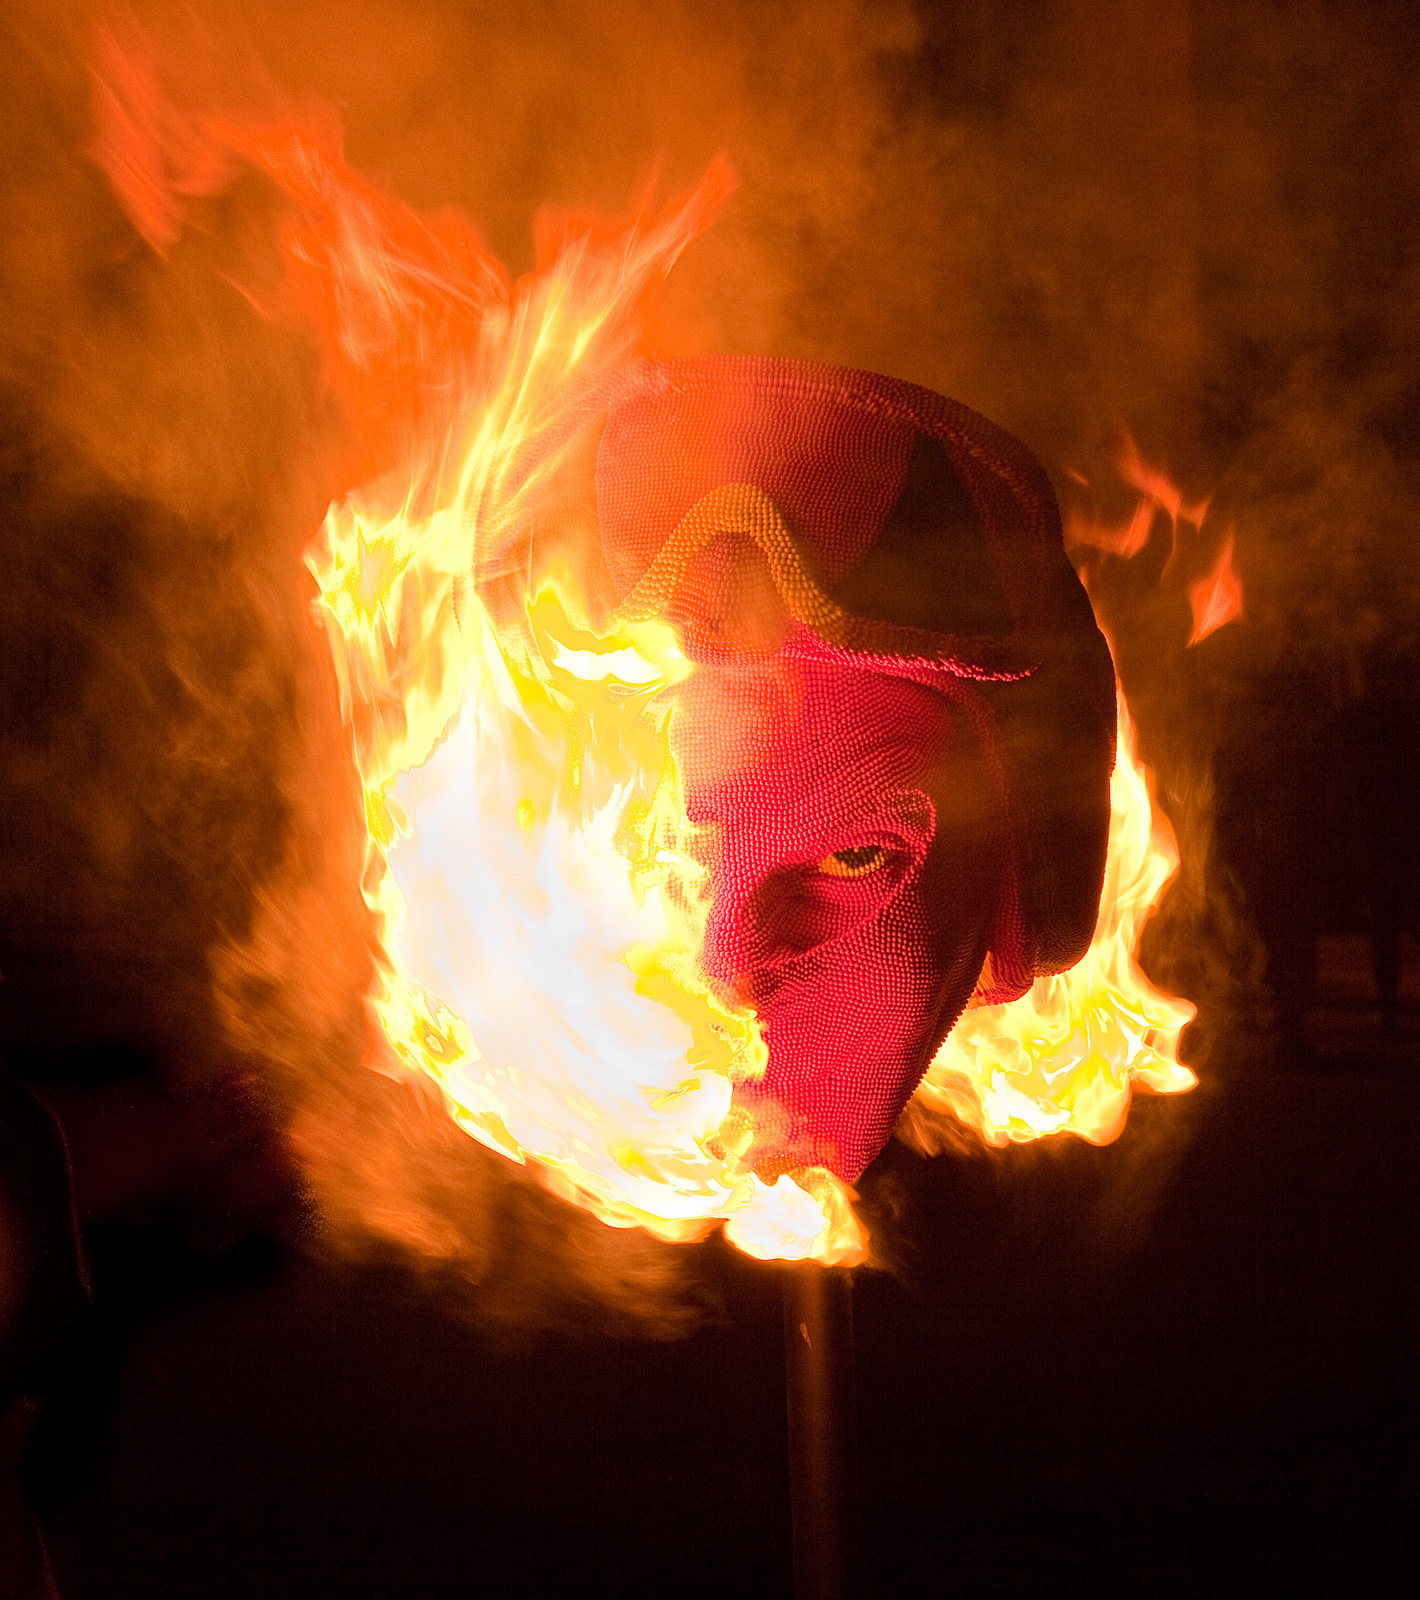 """The Devil"" match head sculpture (burning).  Credit Alan Laughlin."